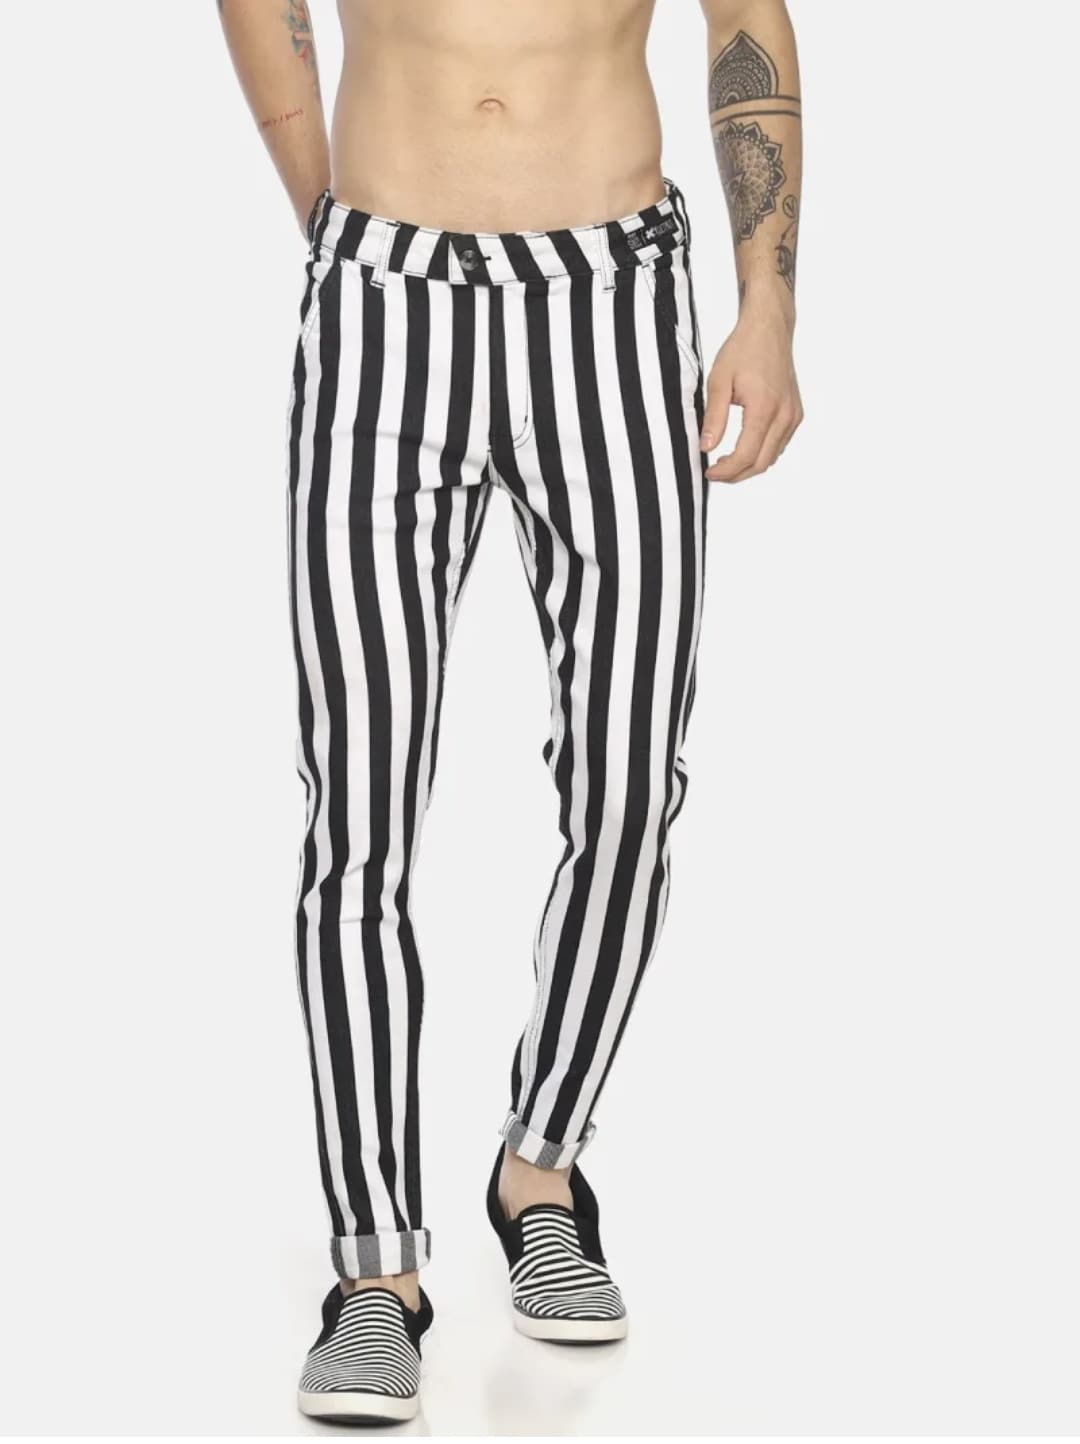 Men's No Wash Printed Stripes Jeans (34,Black & White)